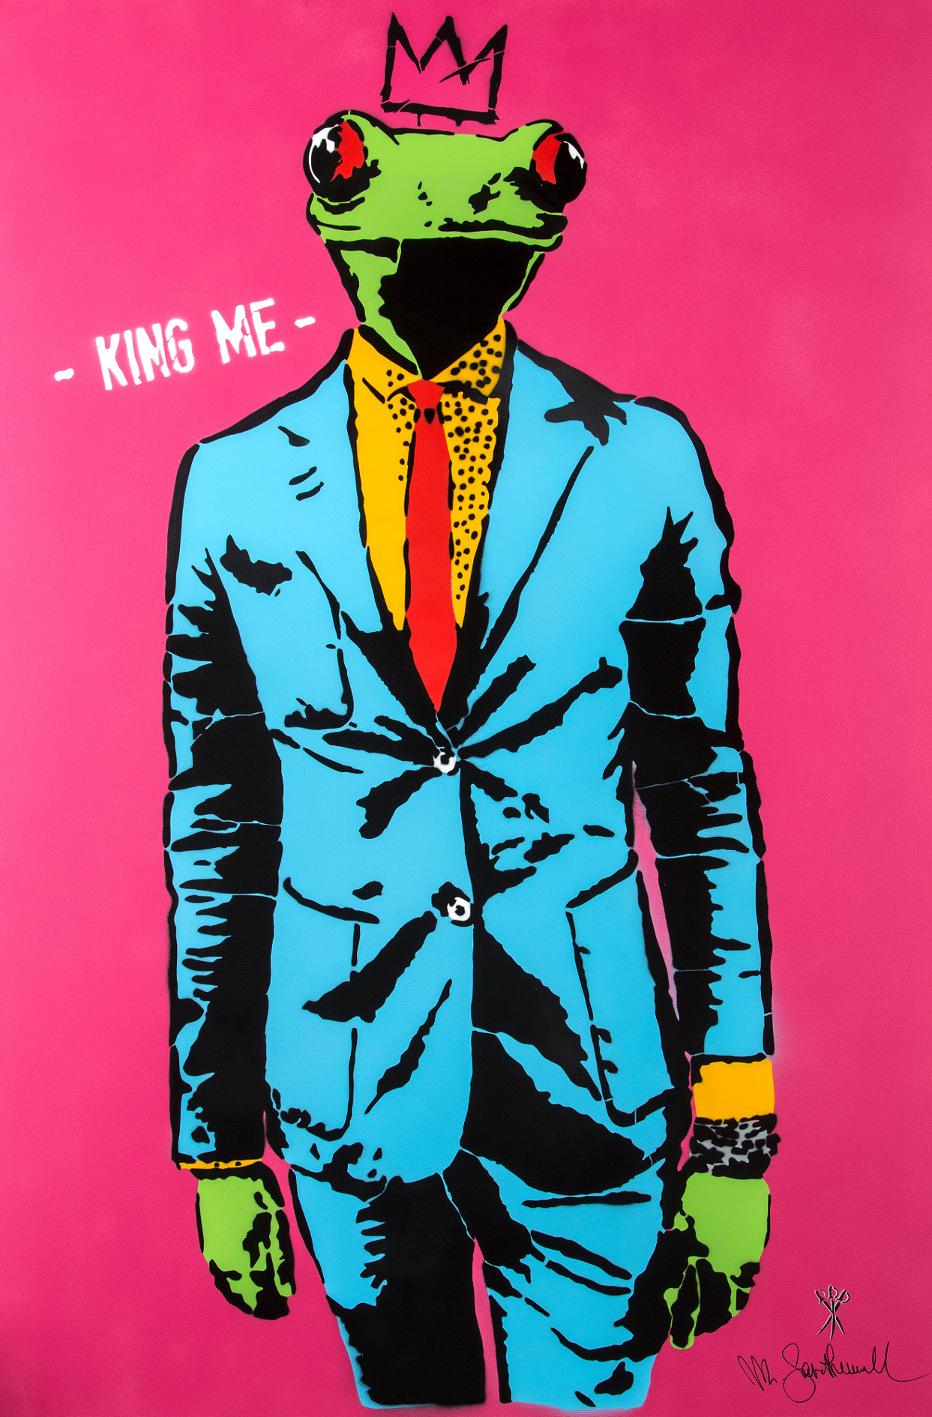 Mr. Savethewall King Me 2018 tecnica mista su tela cm 150x100 © Emanuele Scilleri